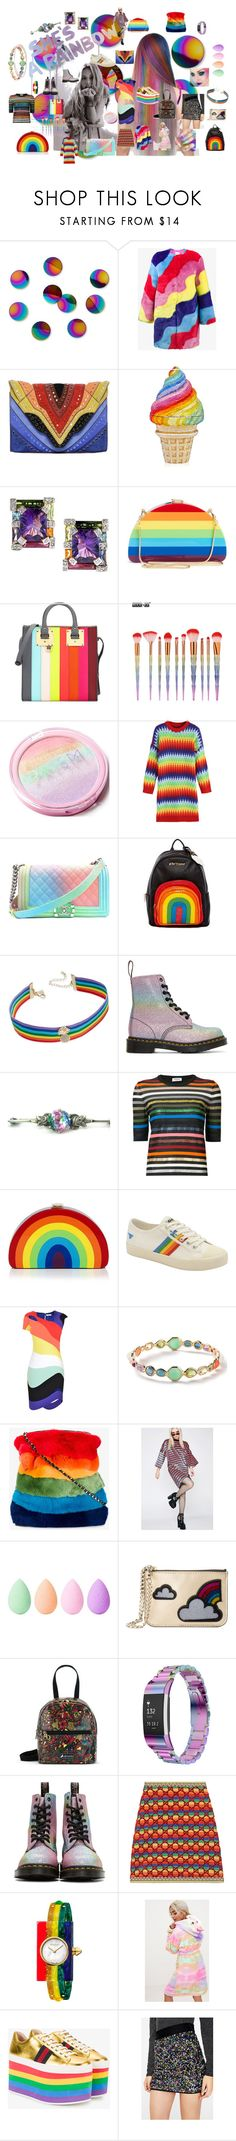 """She's A Rainbow"" by illuminatab on Polyvore featuring Umbra, Mira Mikati, Elena Ghisellini, Milly, Sophie Hulme, Betsey Johnson, INC International Concepts, Dr. Martens, Sonia Rykiel and Gola"